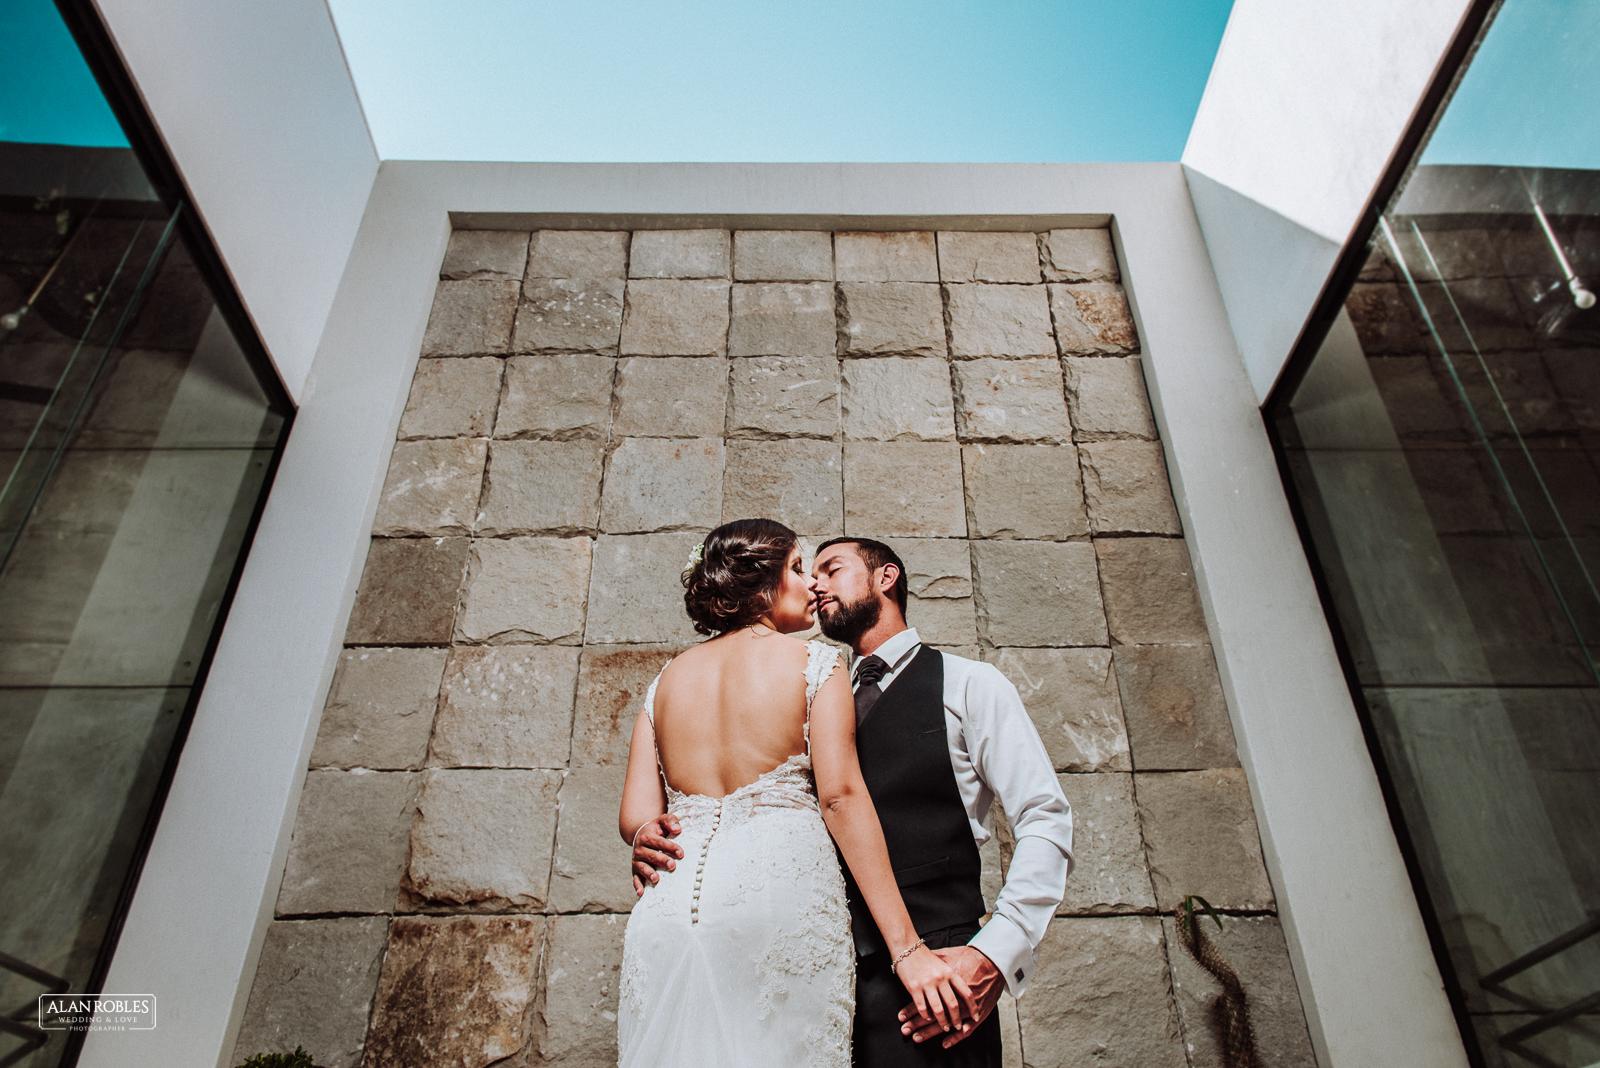 Fotografo de bodas Alan Robles-Boda en Guadalajara Real San Javier-39